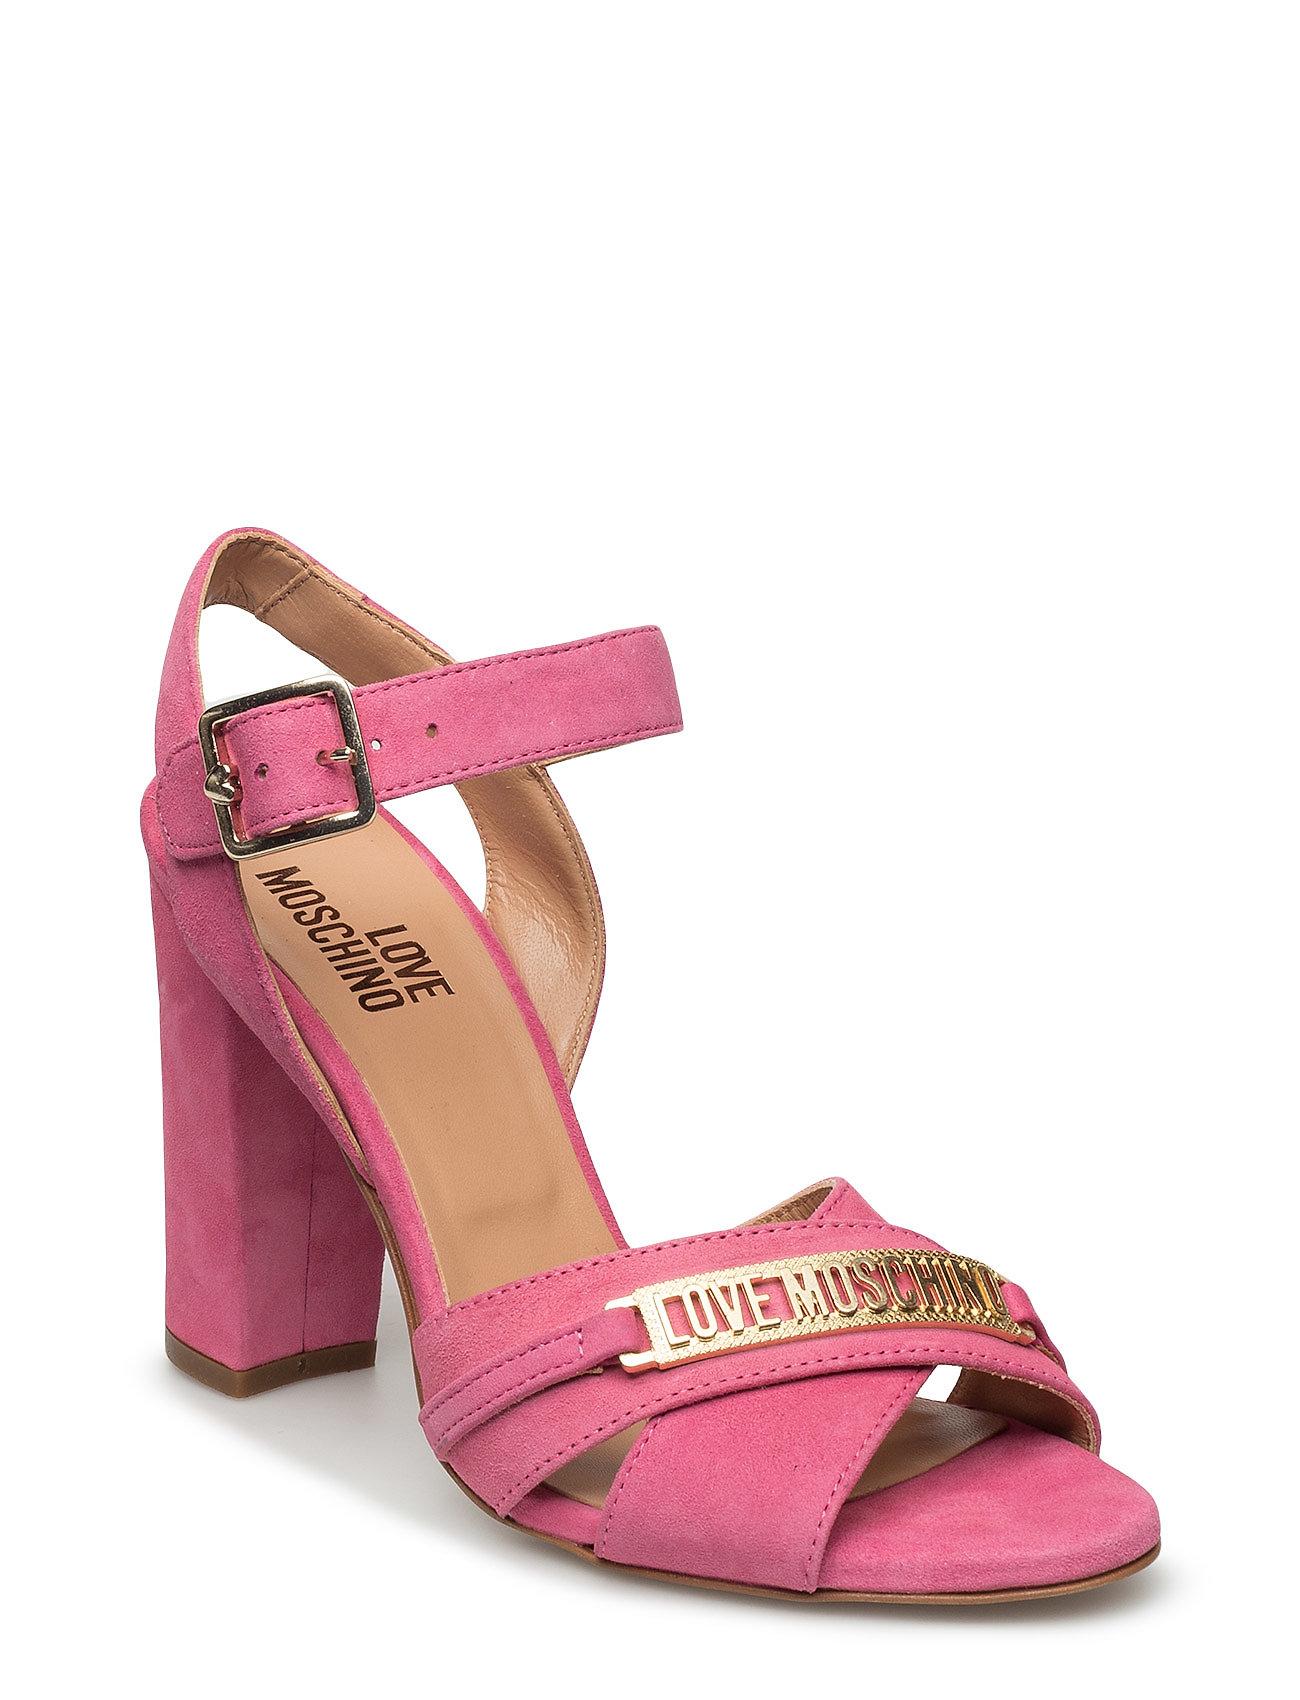 Love Moschino-Sandal Love Moschino Sko til Kvinder i